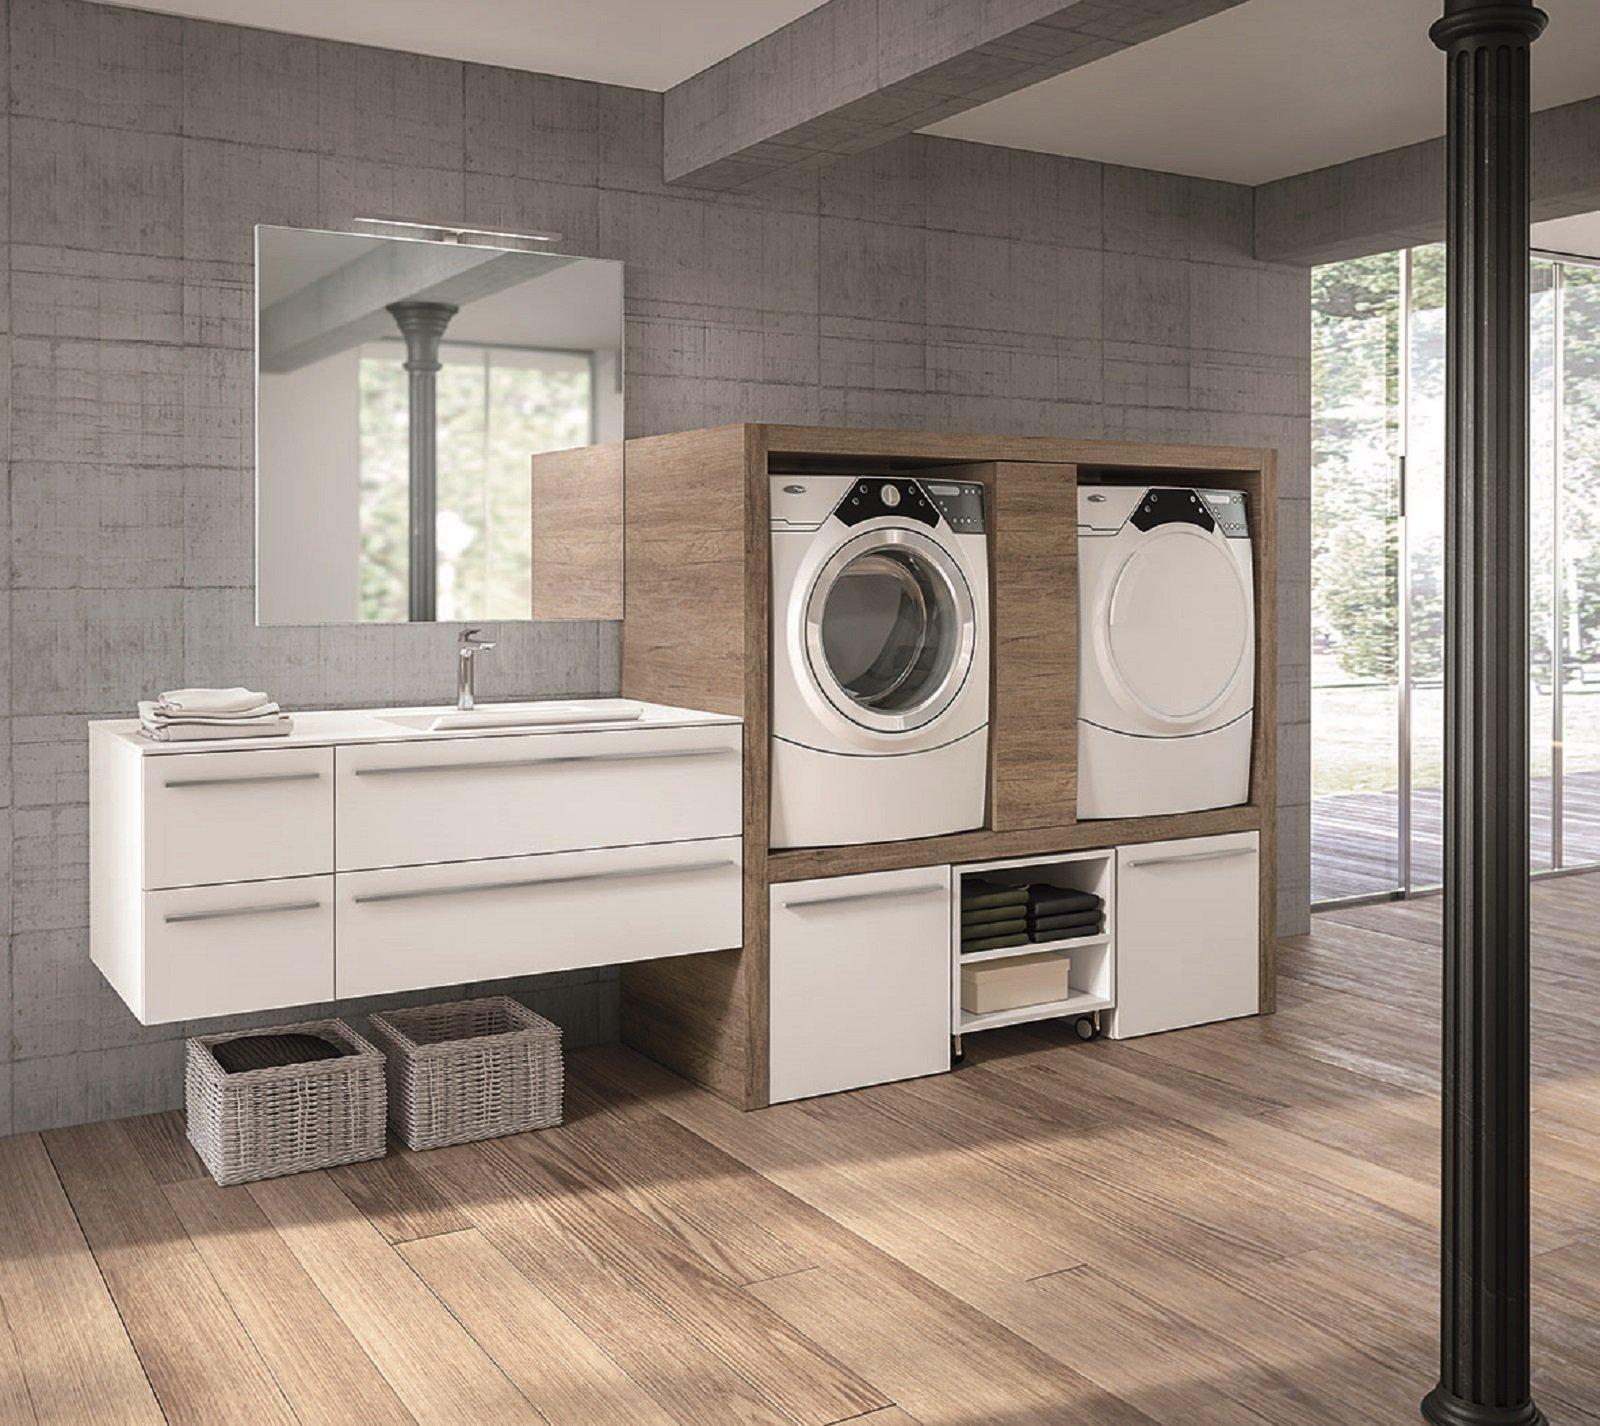 Lavanderia in bagno - Cose di Casa